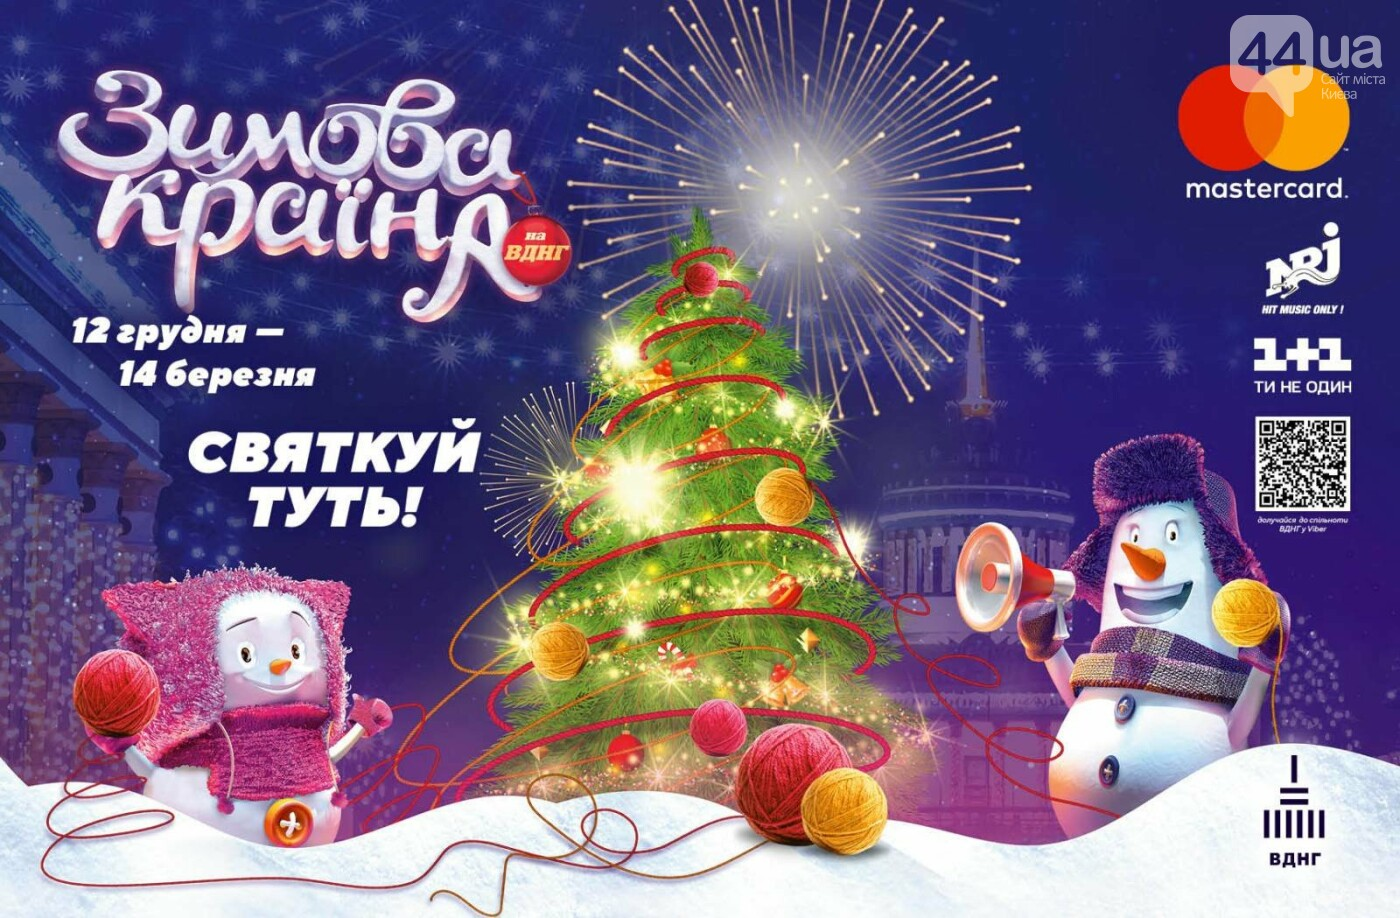 «Зимова країна на ВДНГ» снова объединит киевлян и гостей столицы, фото-1